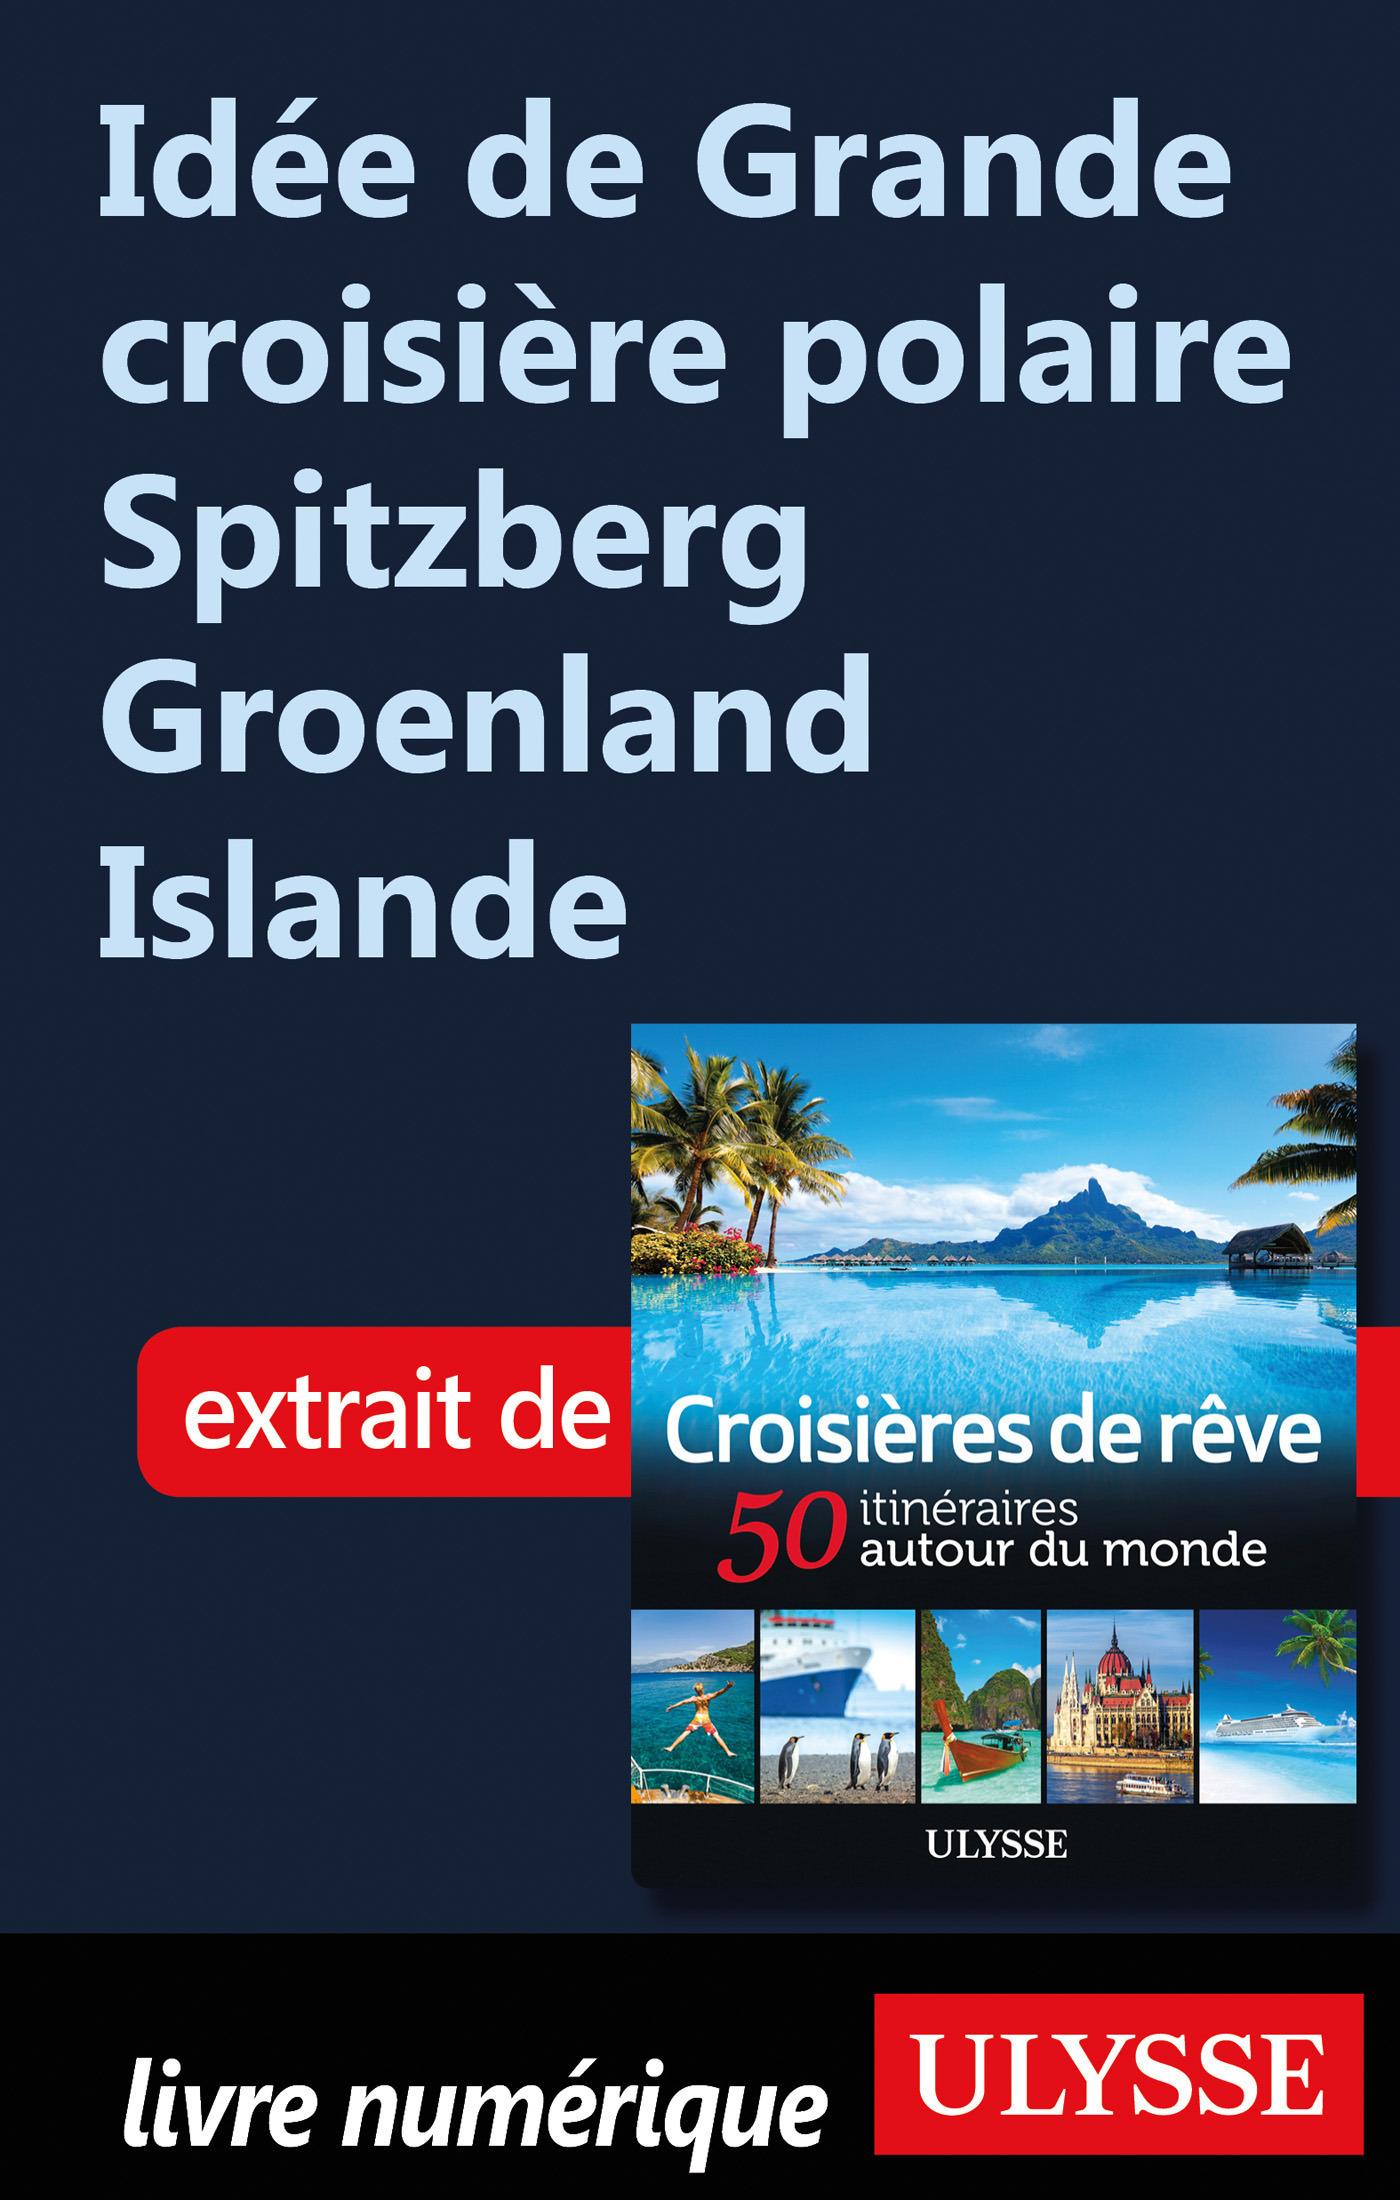 Idée de Grande croisière polaire Spitzberg Groenland Islande